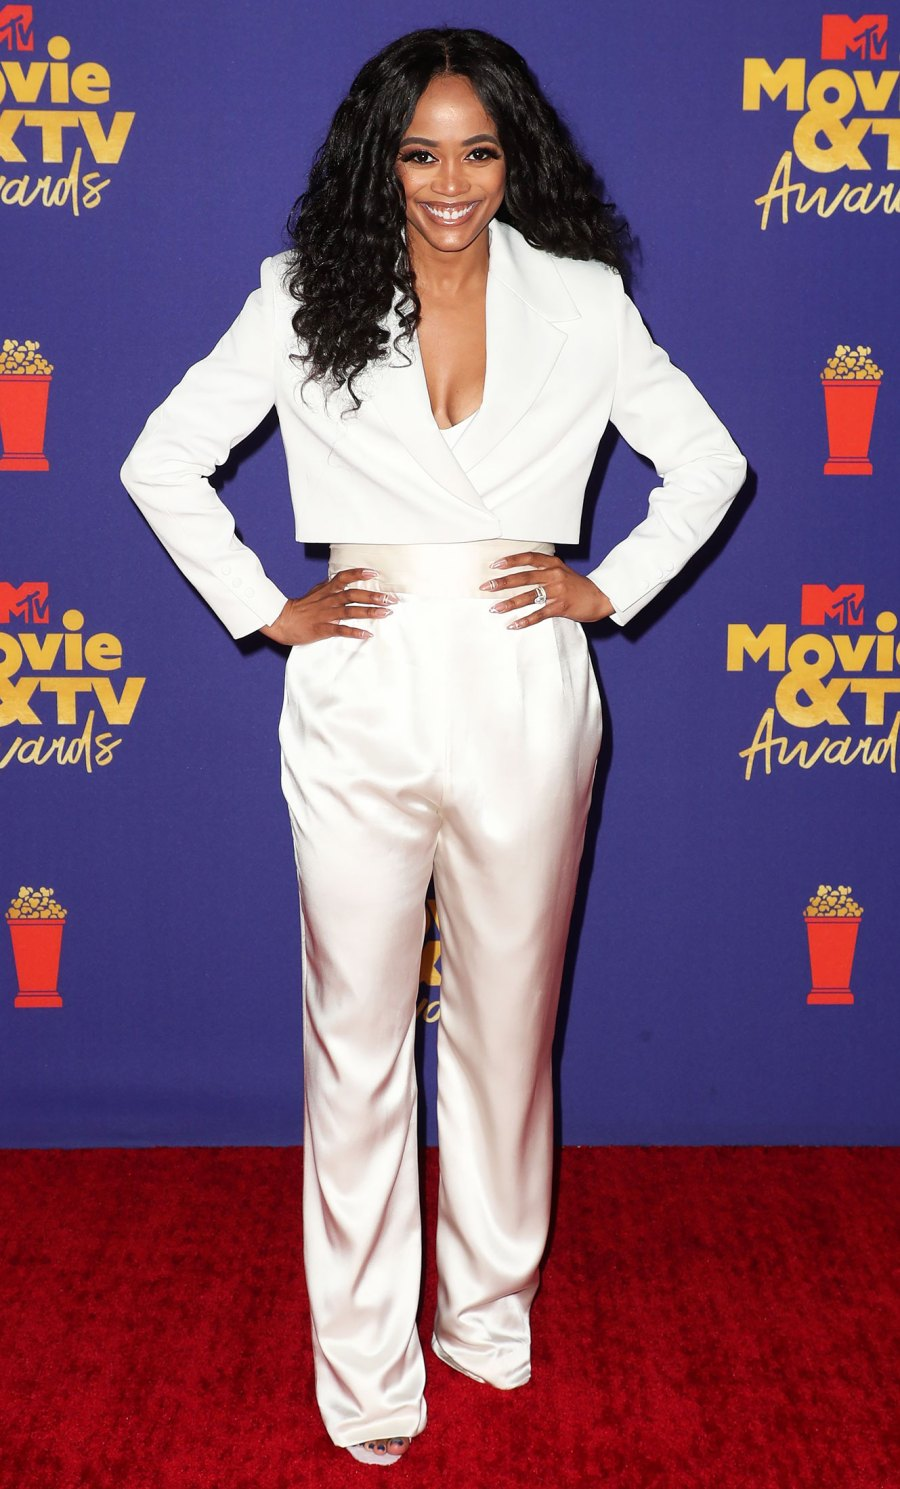 MTV Movie & TV Awards Red Carpet Arrivals - Rachel Lindsay